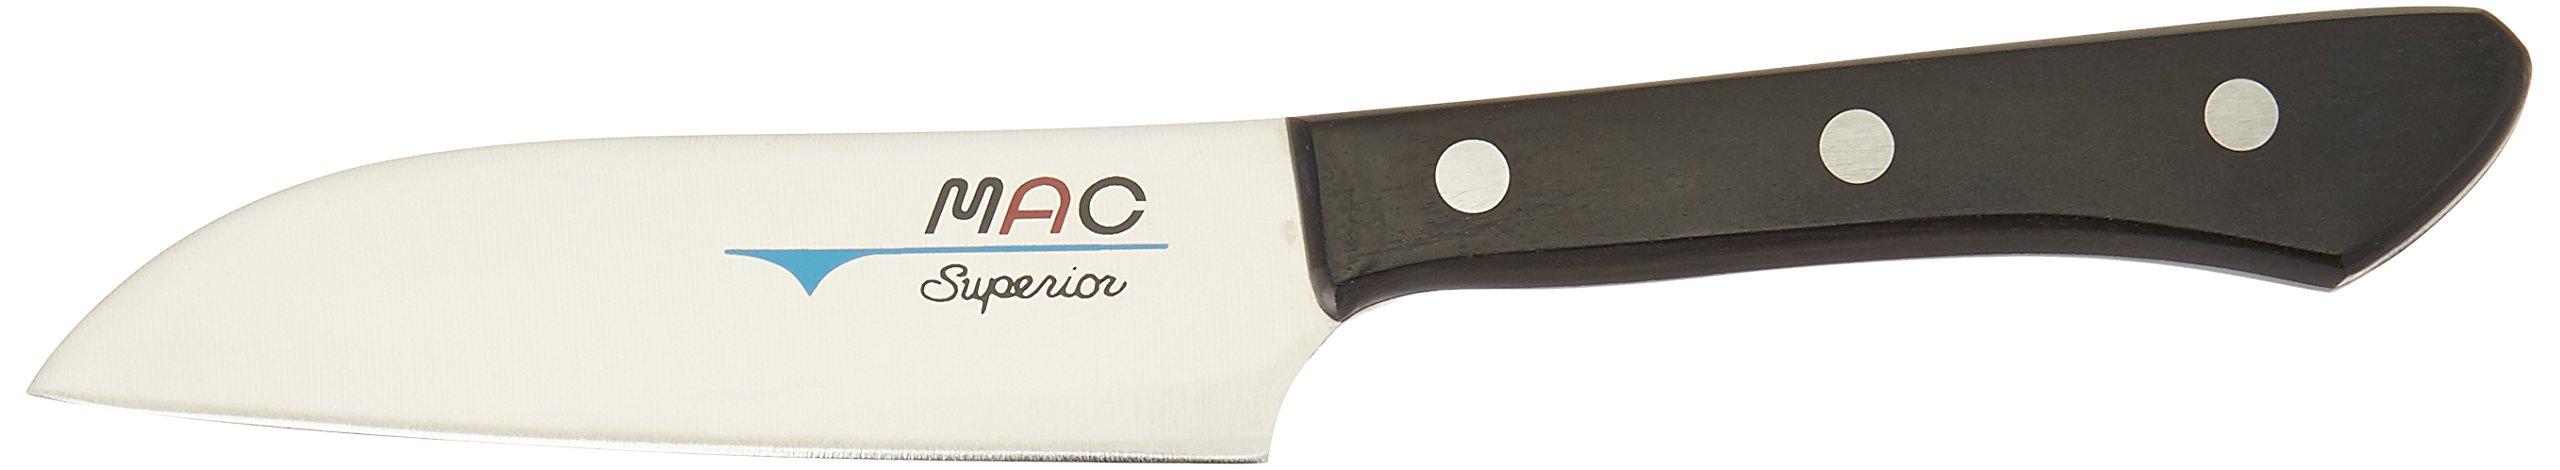 Mac Knife Superior Santoku/Paring Knife, 4-Inch